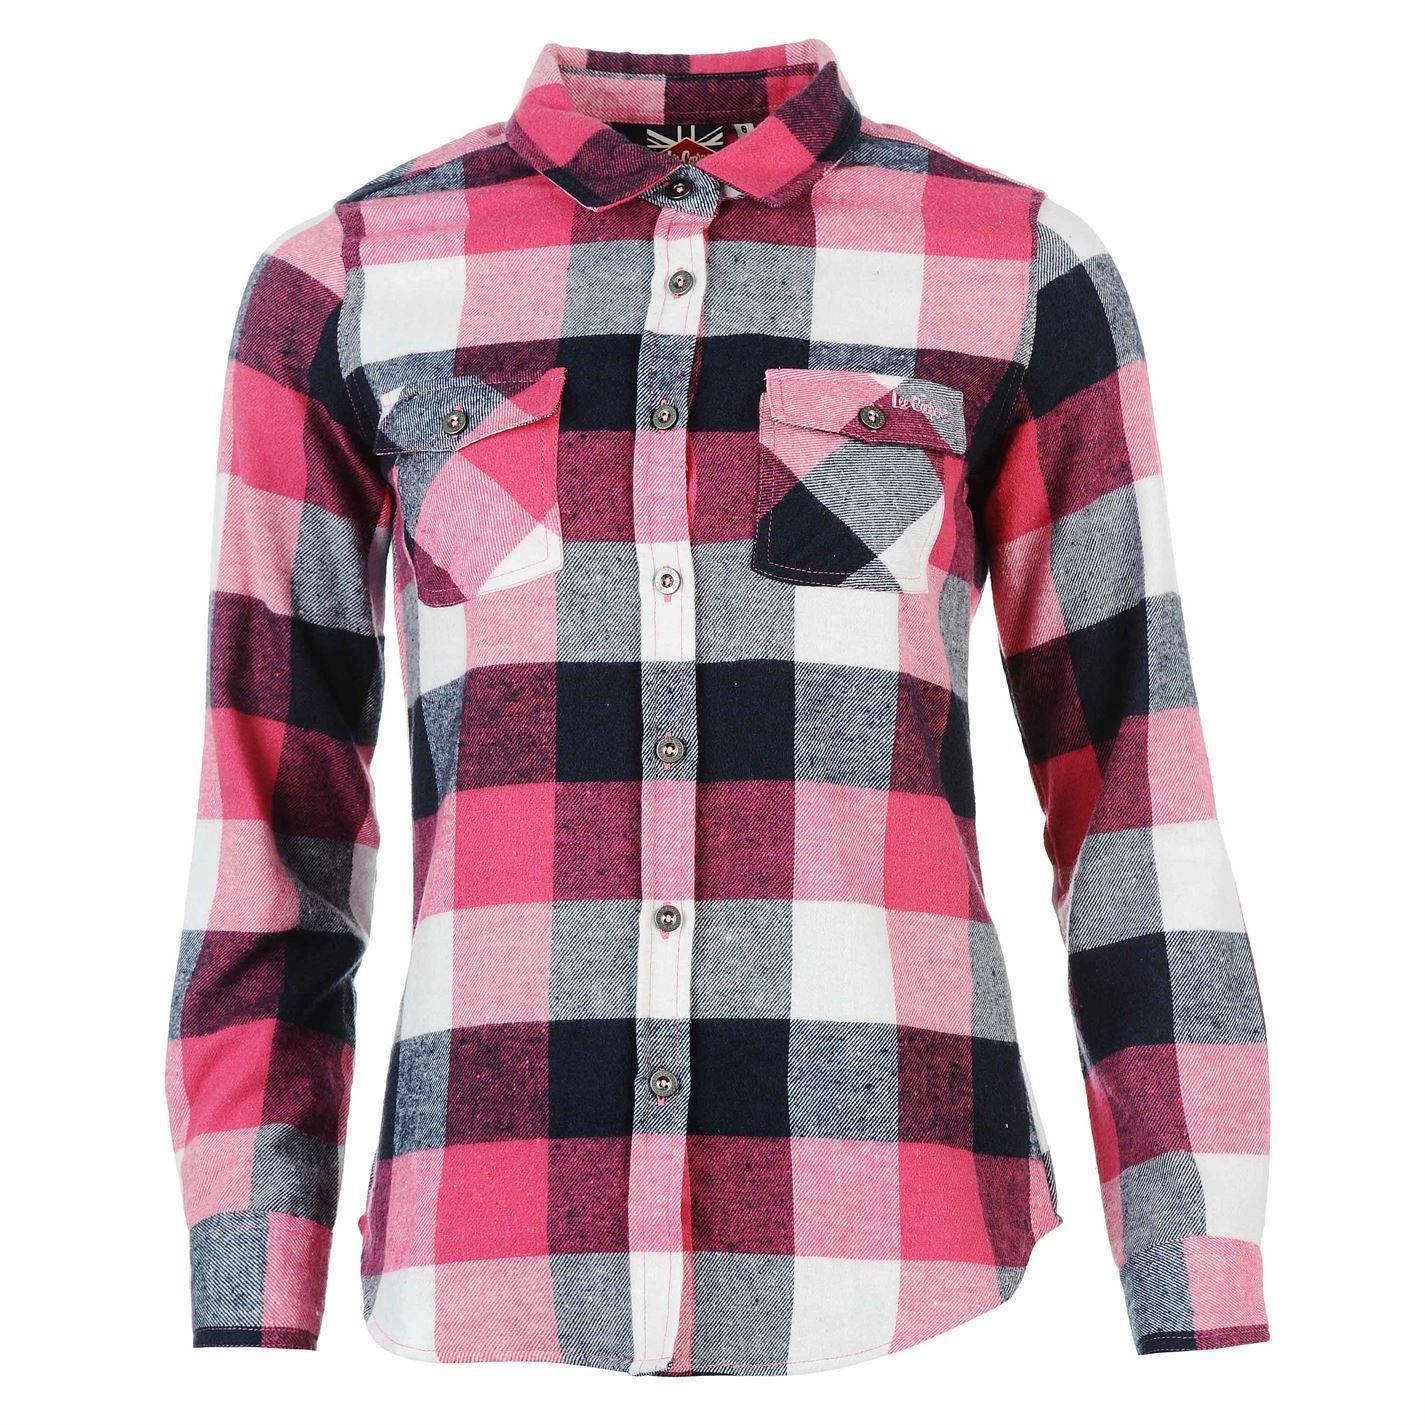 Best flannel shirt